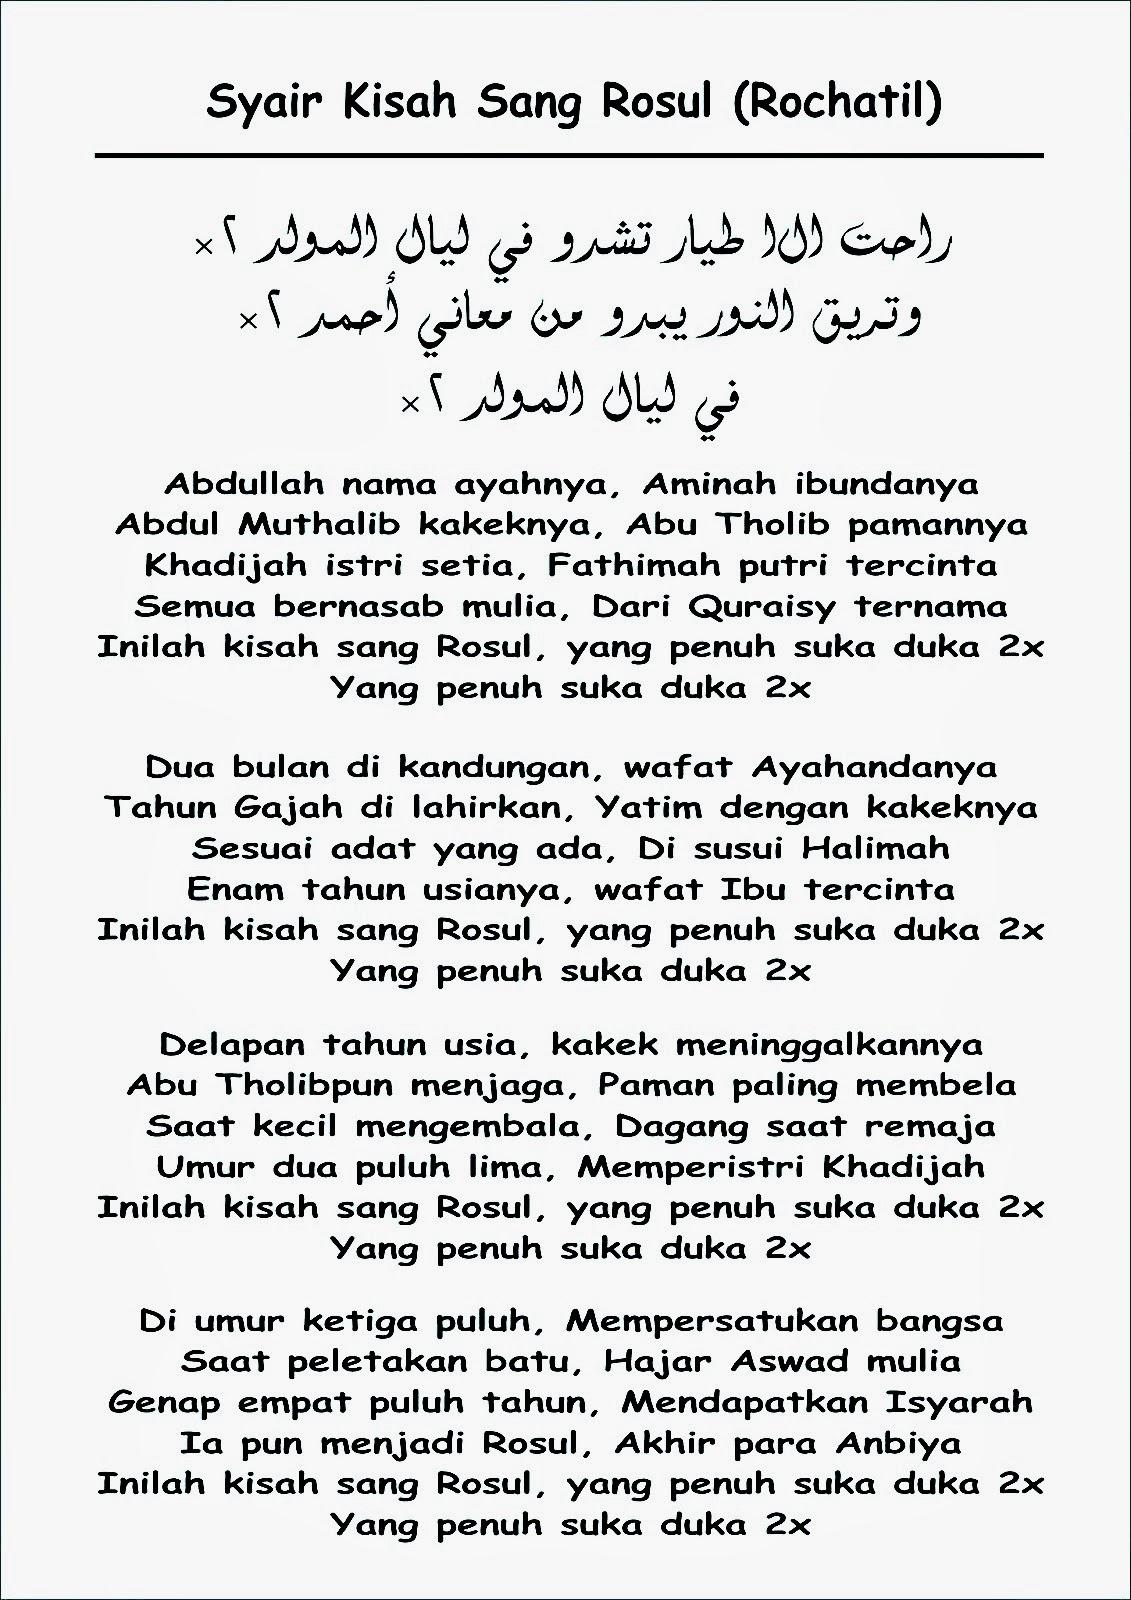 Lirik Kisah Sang Rasul Habib Syech Bin Abdul Qodir Assegaf Lirik